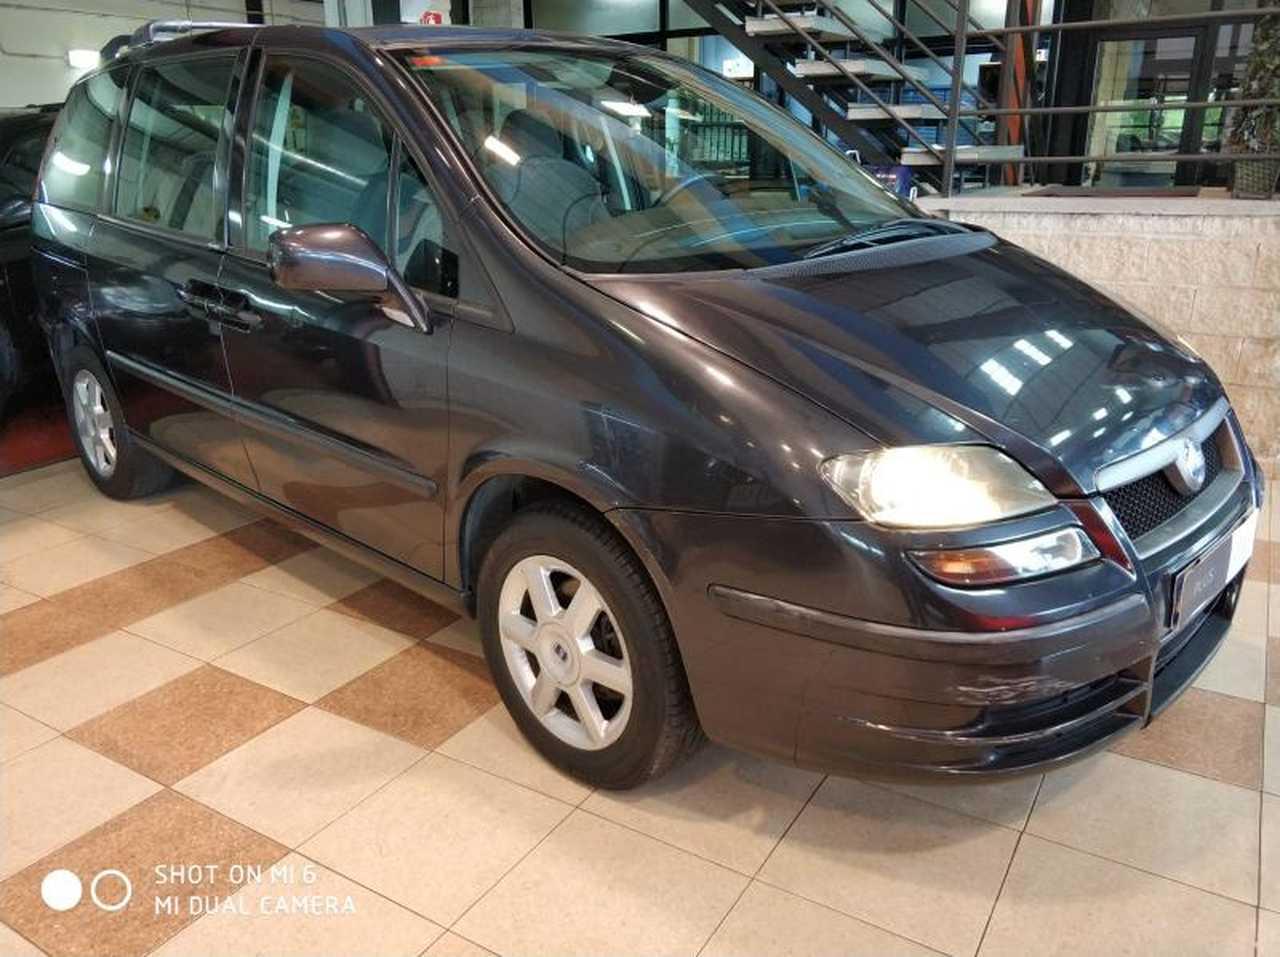 Fiat Ulysse 7 plazas   - Foto 1